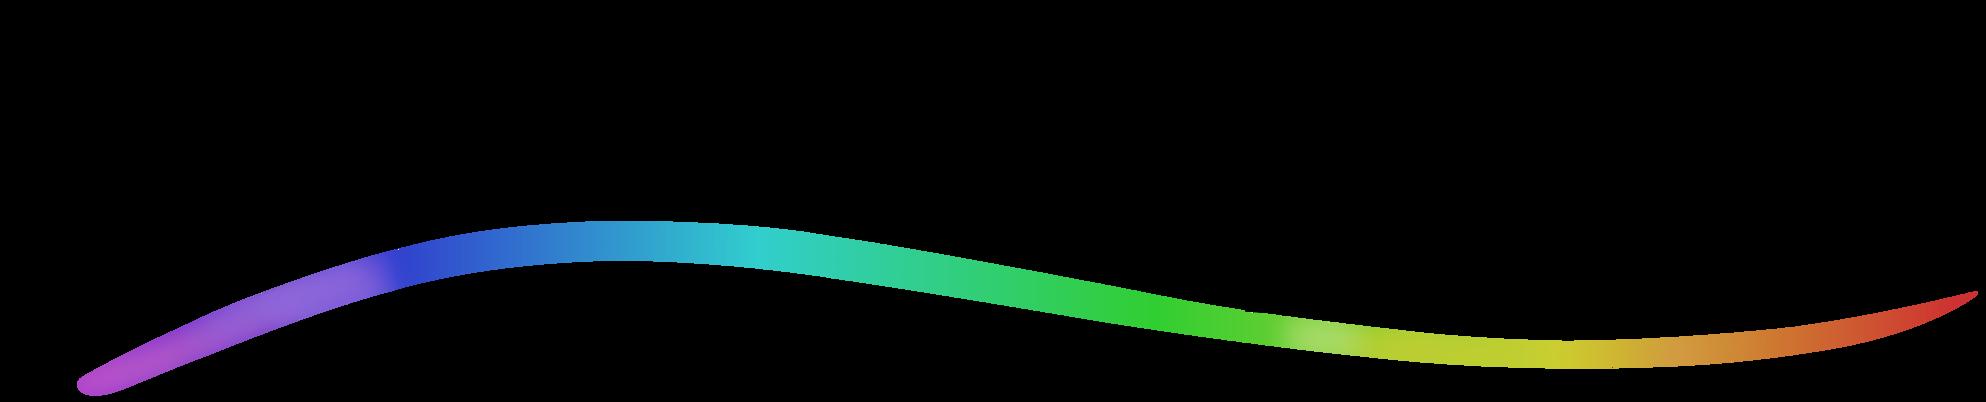 File:Paint tool sai logo.png - Wikimedia Commons